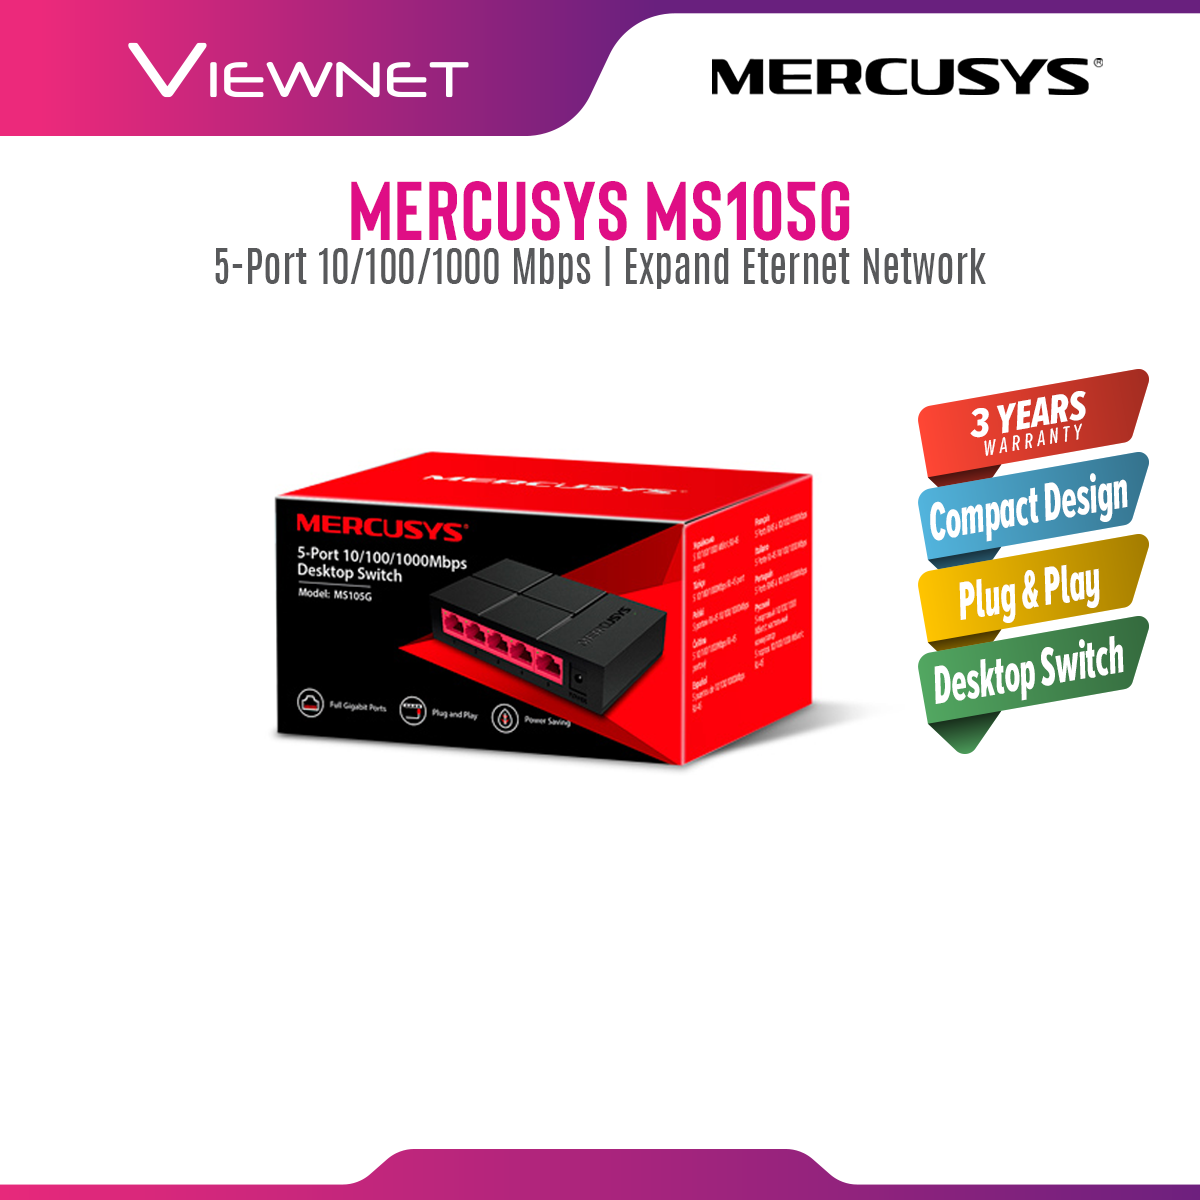 Mercusys (Powered by TP-Link) 5-Port Gigabit 10/100/1000 Mbps Desktop Network Ethernet LAN Switch MS105G (TP LINK)